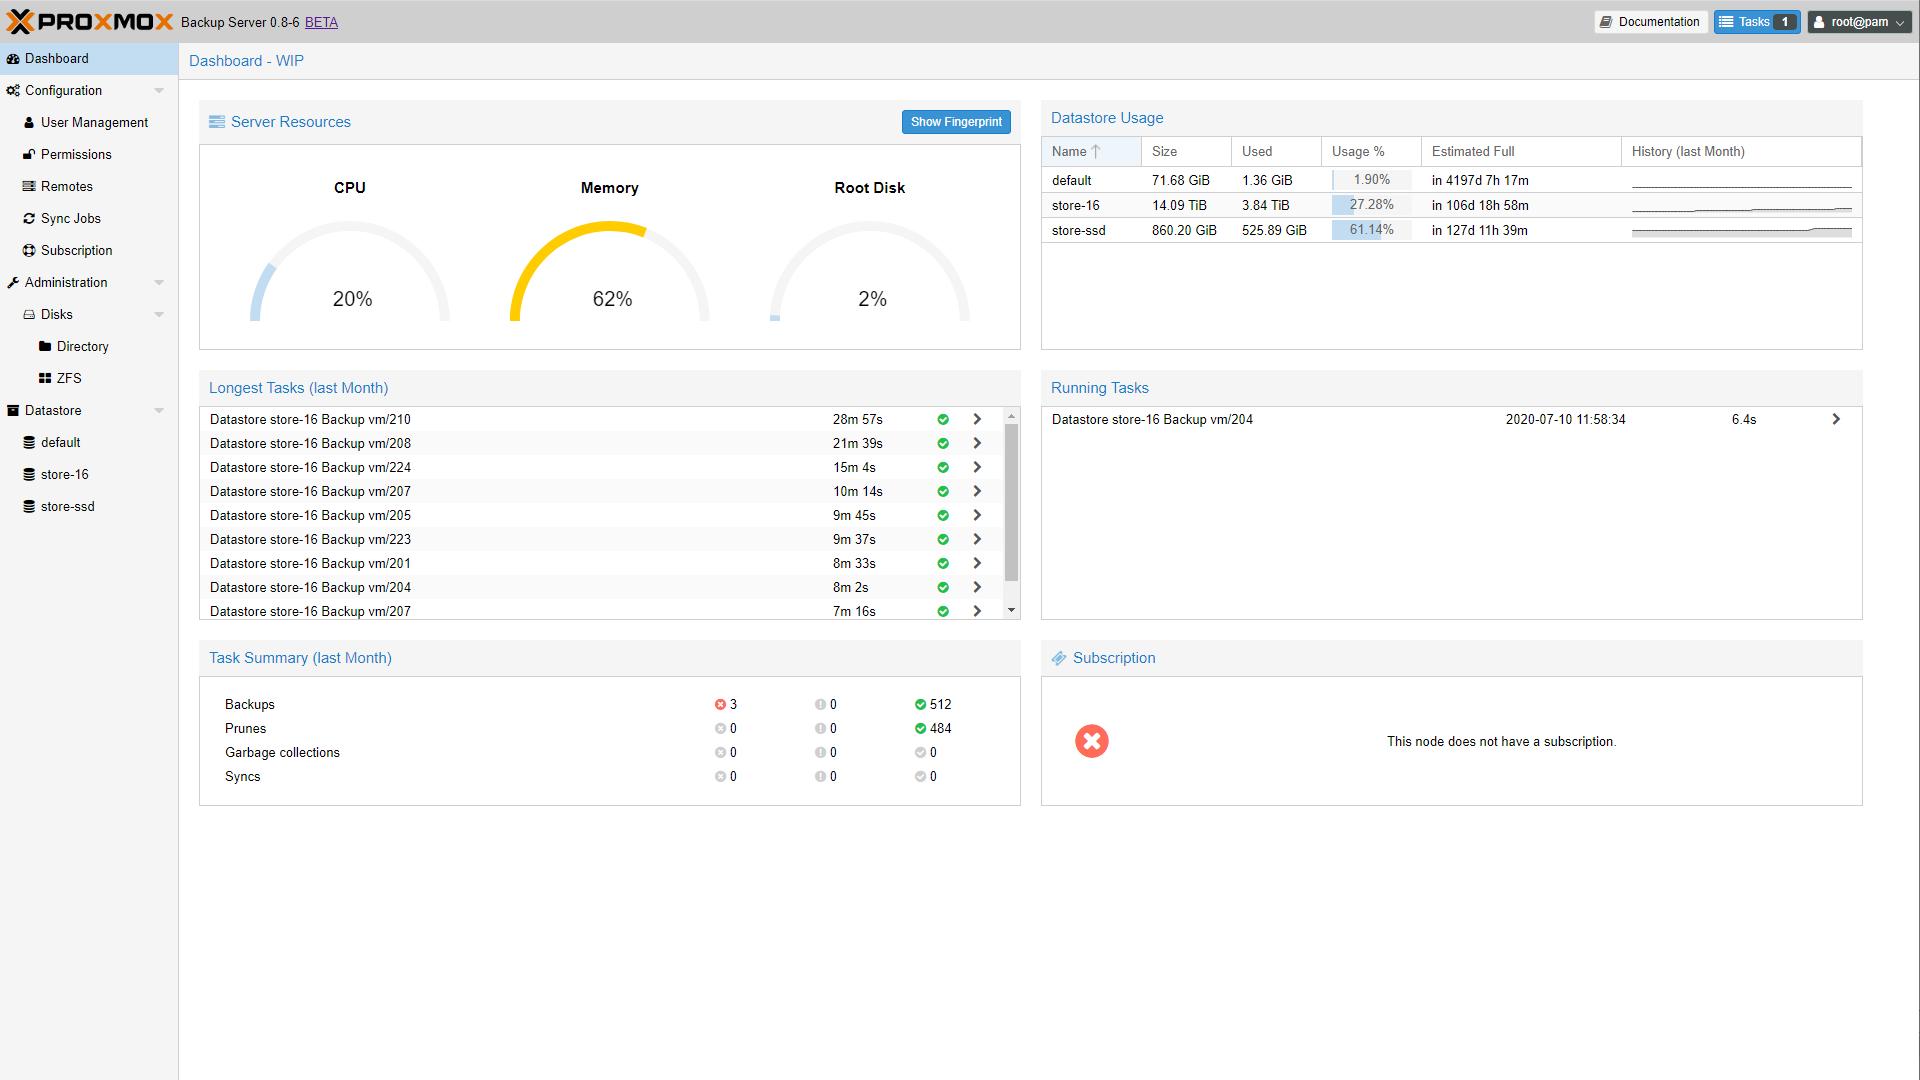 Proxmox Backup Server (beta) - Dashboard view